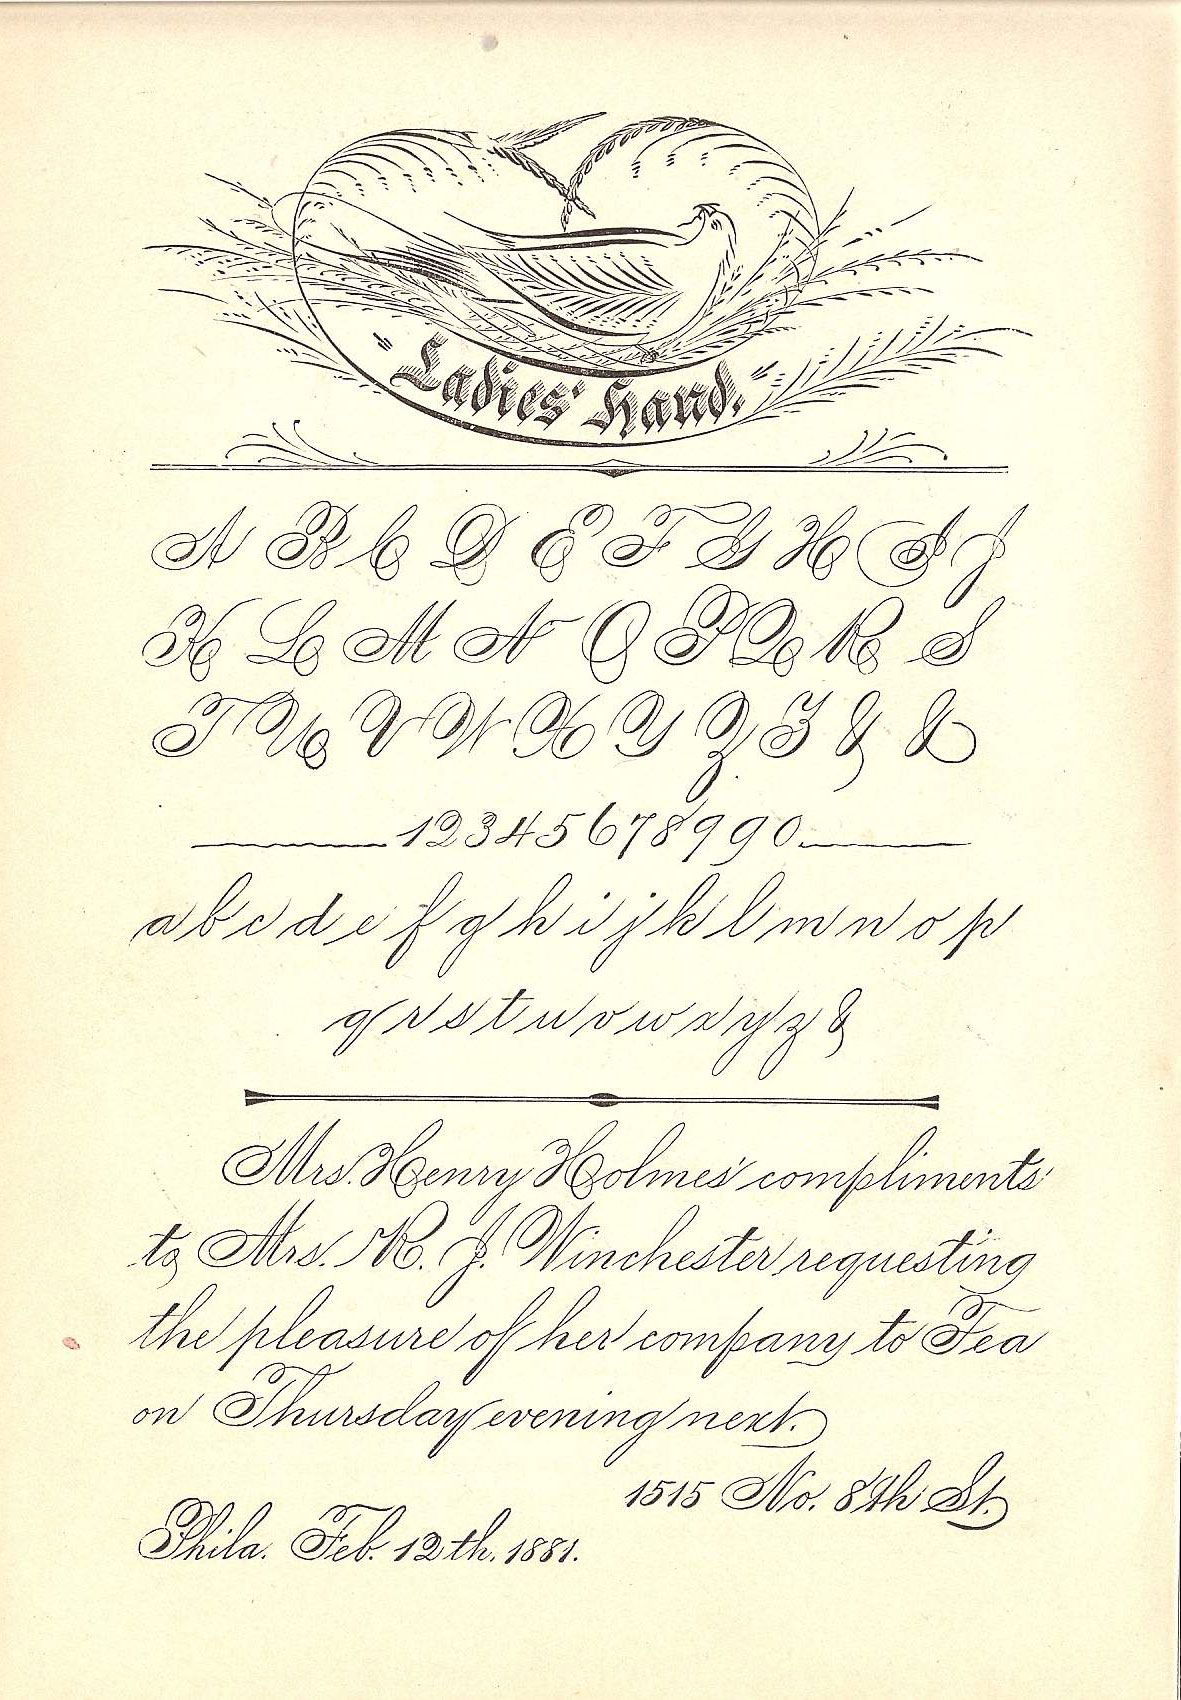 La S Hand Spencerian Script